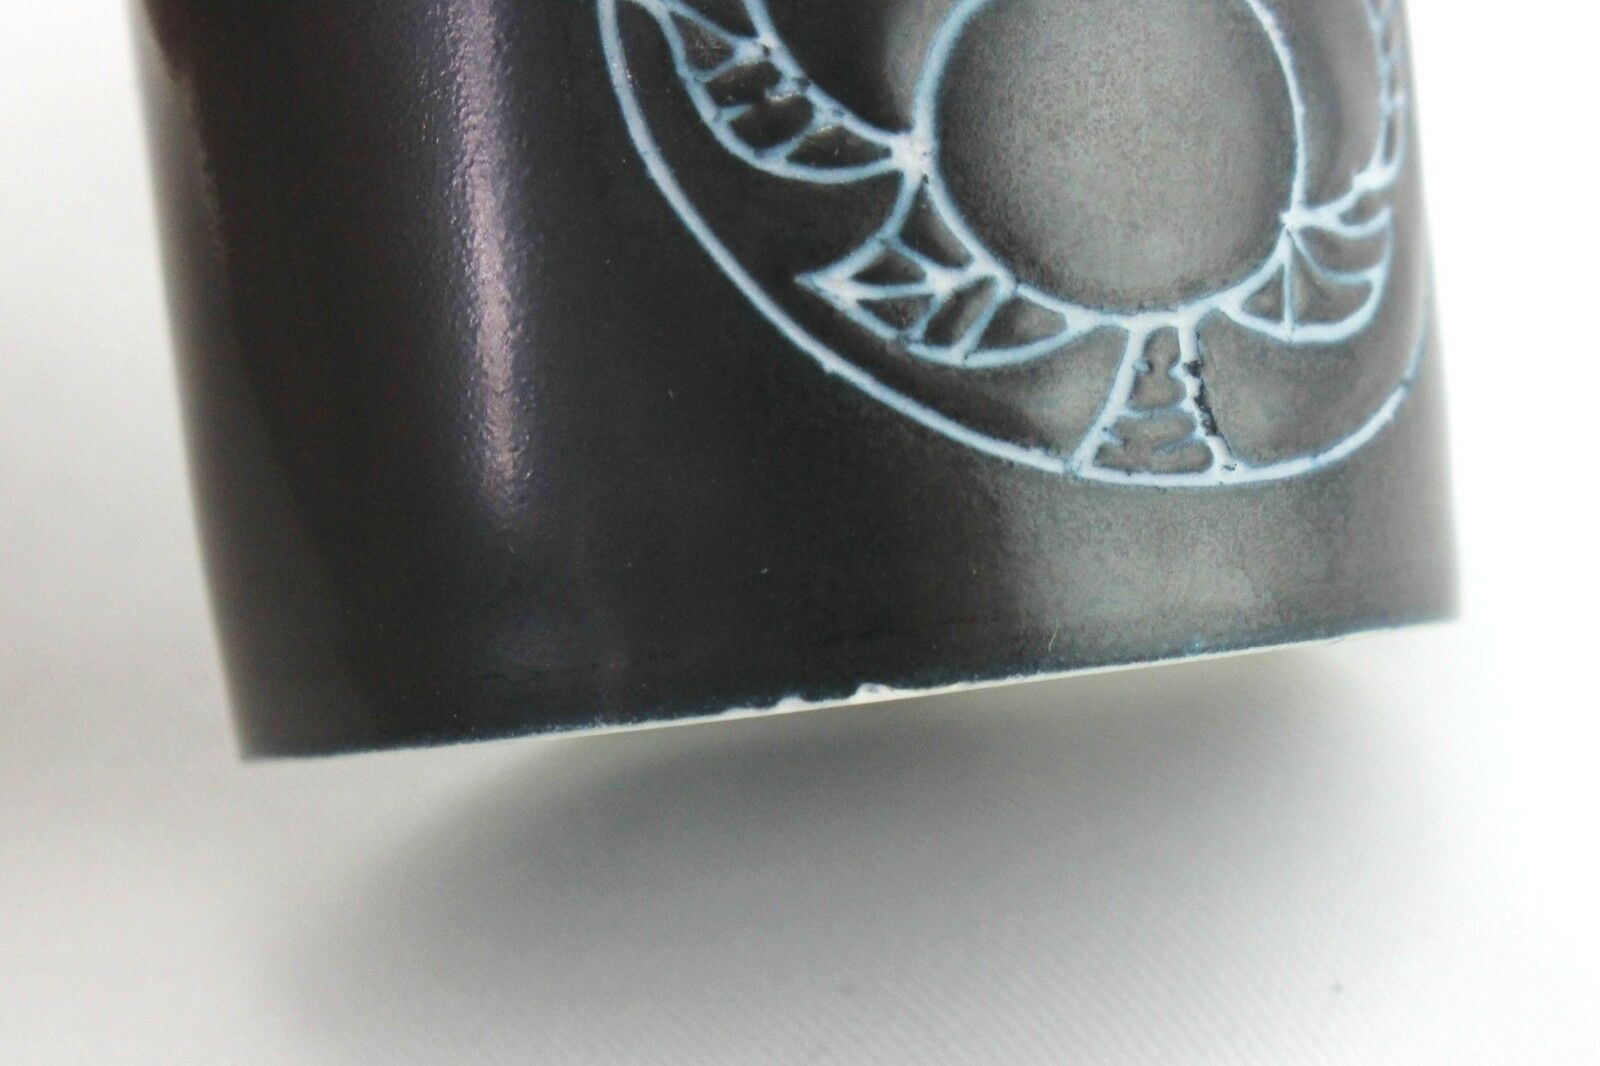 6 x Arabia shot     snaps cups Olli Vasa Finnish pottery design 1960's 36fe10